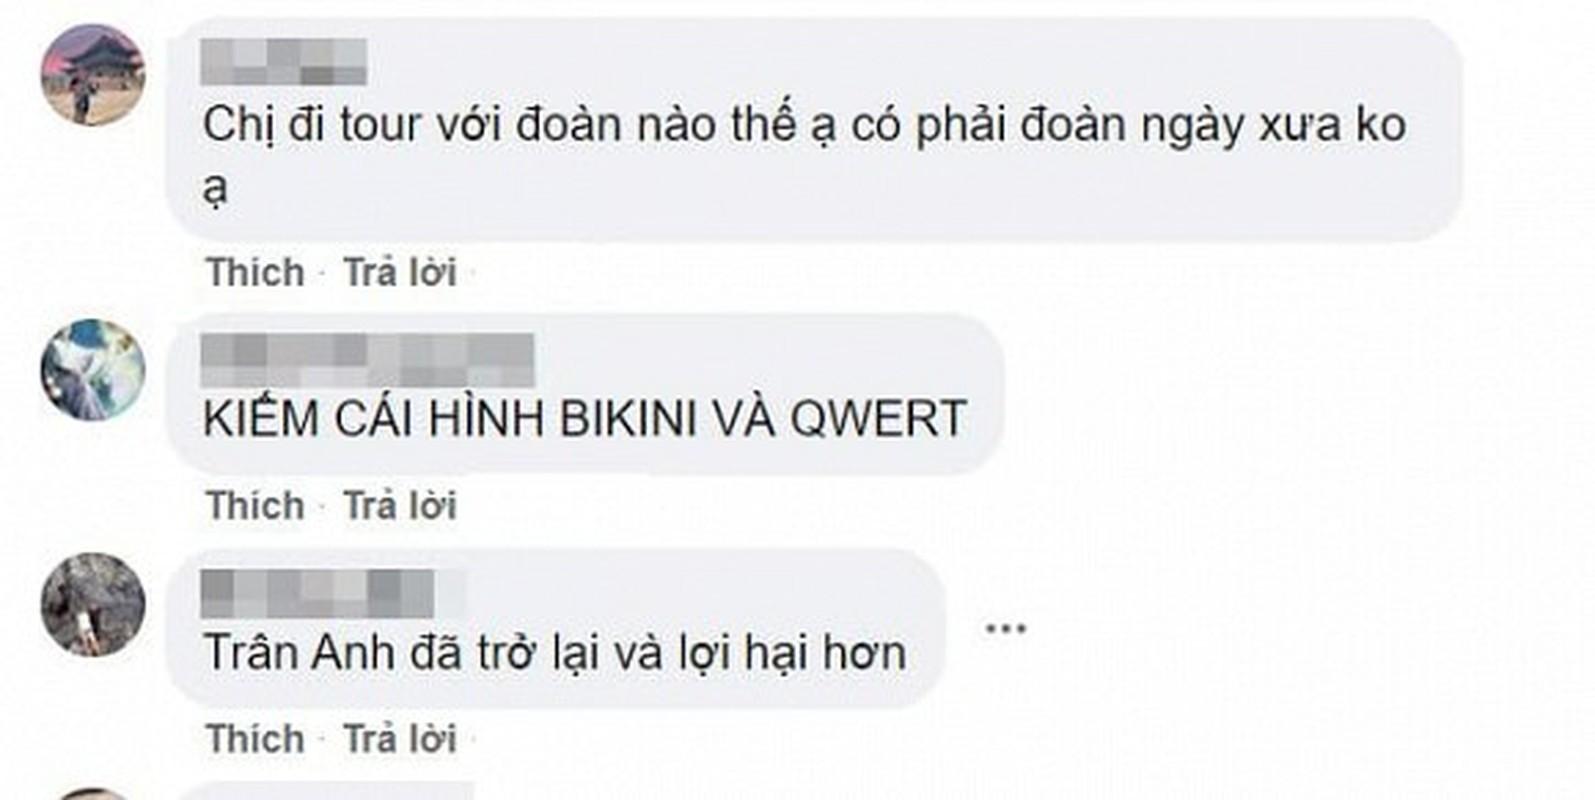 Hot girl Tram Anh lai bi loi chuyen cu sau man dang anh qua da-Hinh-8